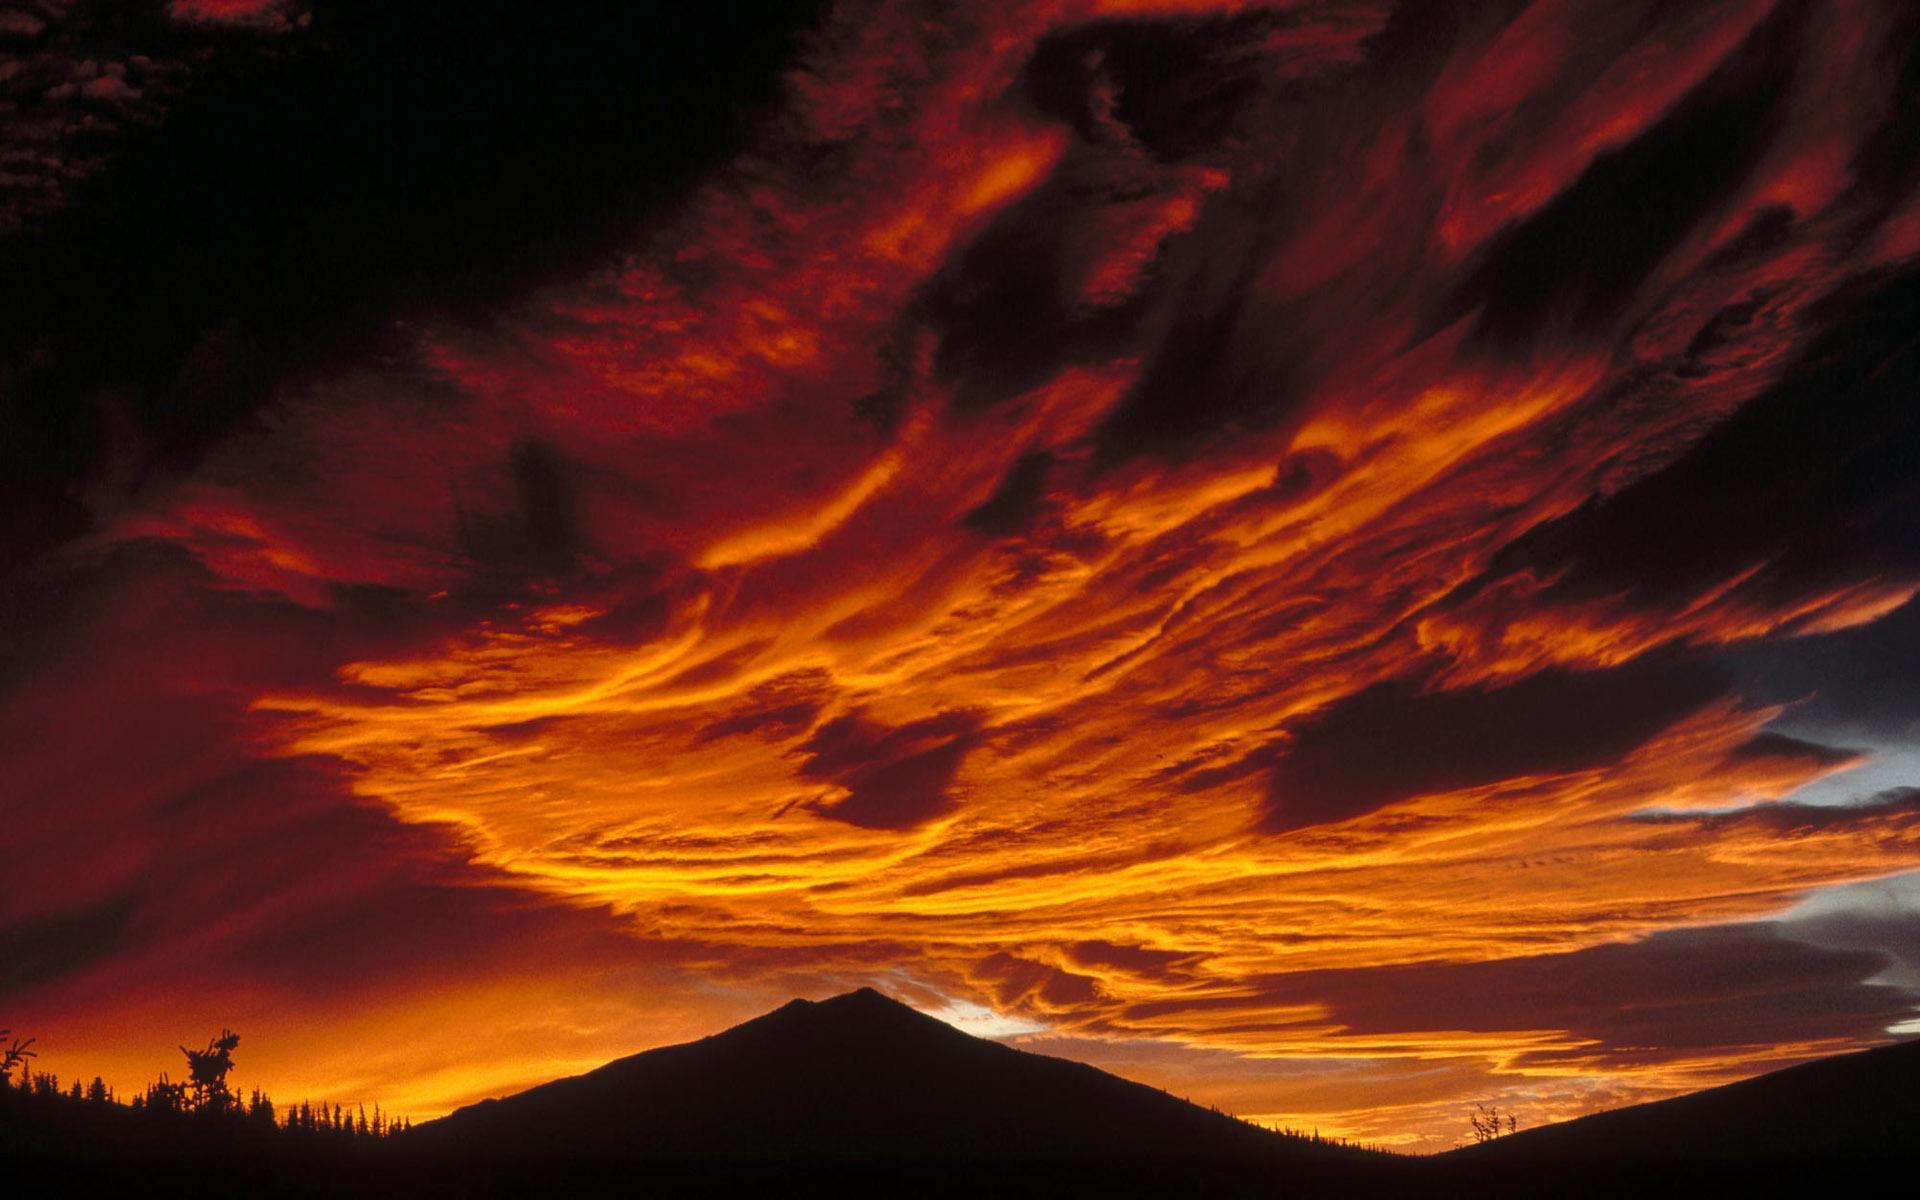 Alaska Sunset Orange Sky Hd Wallpaper Wallpaper List 1920x1200